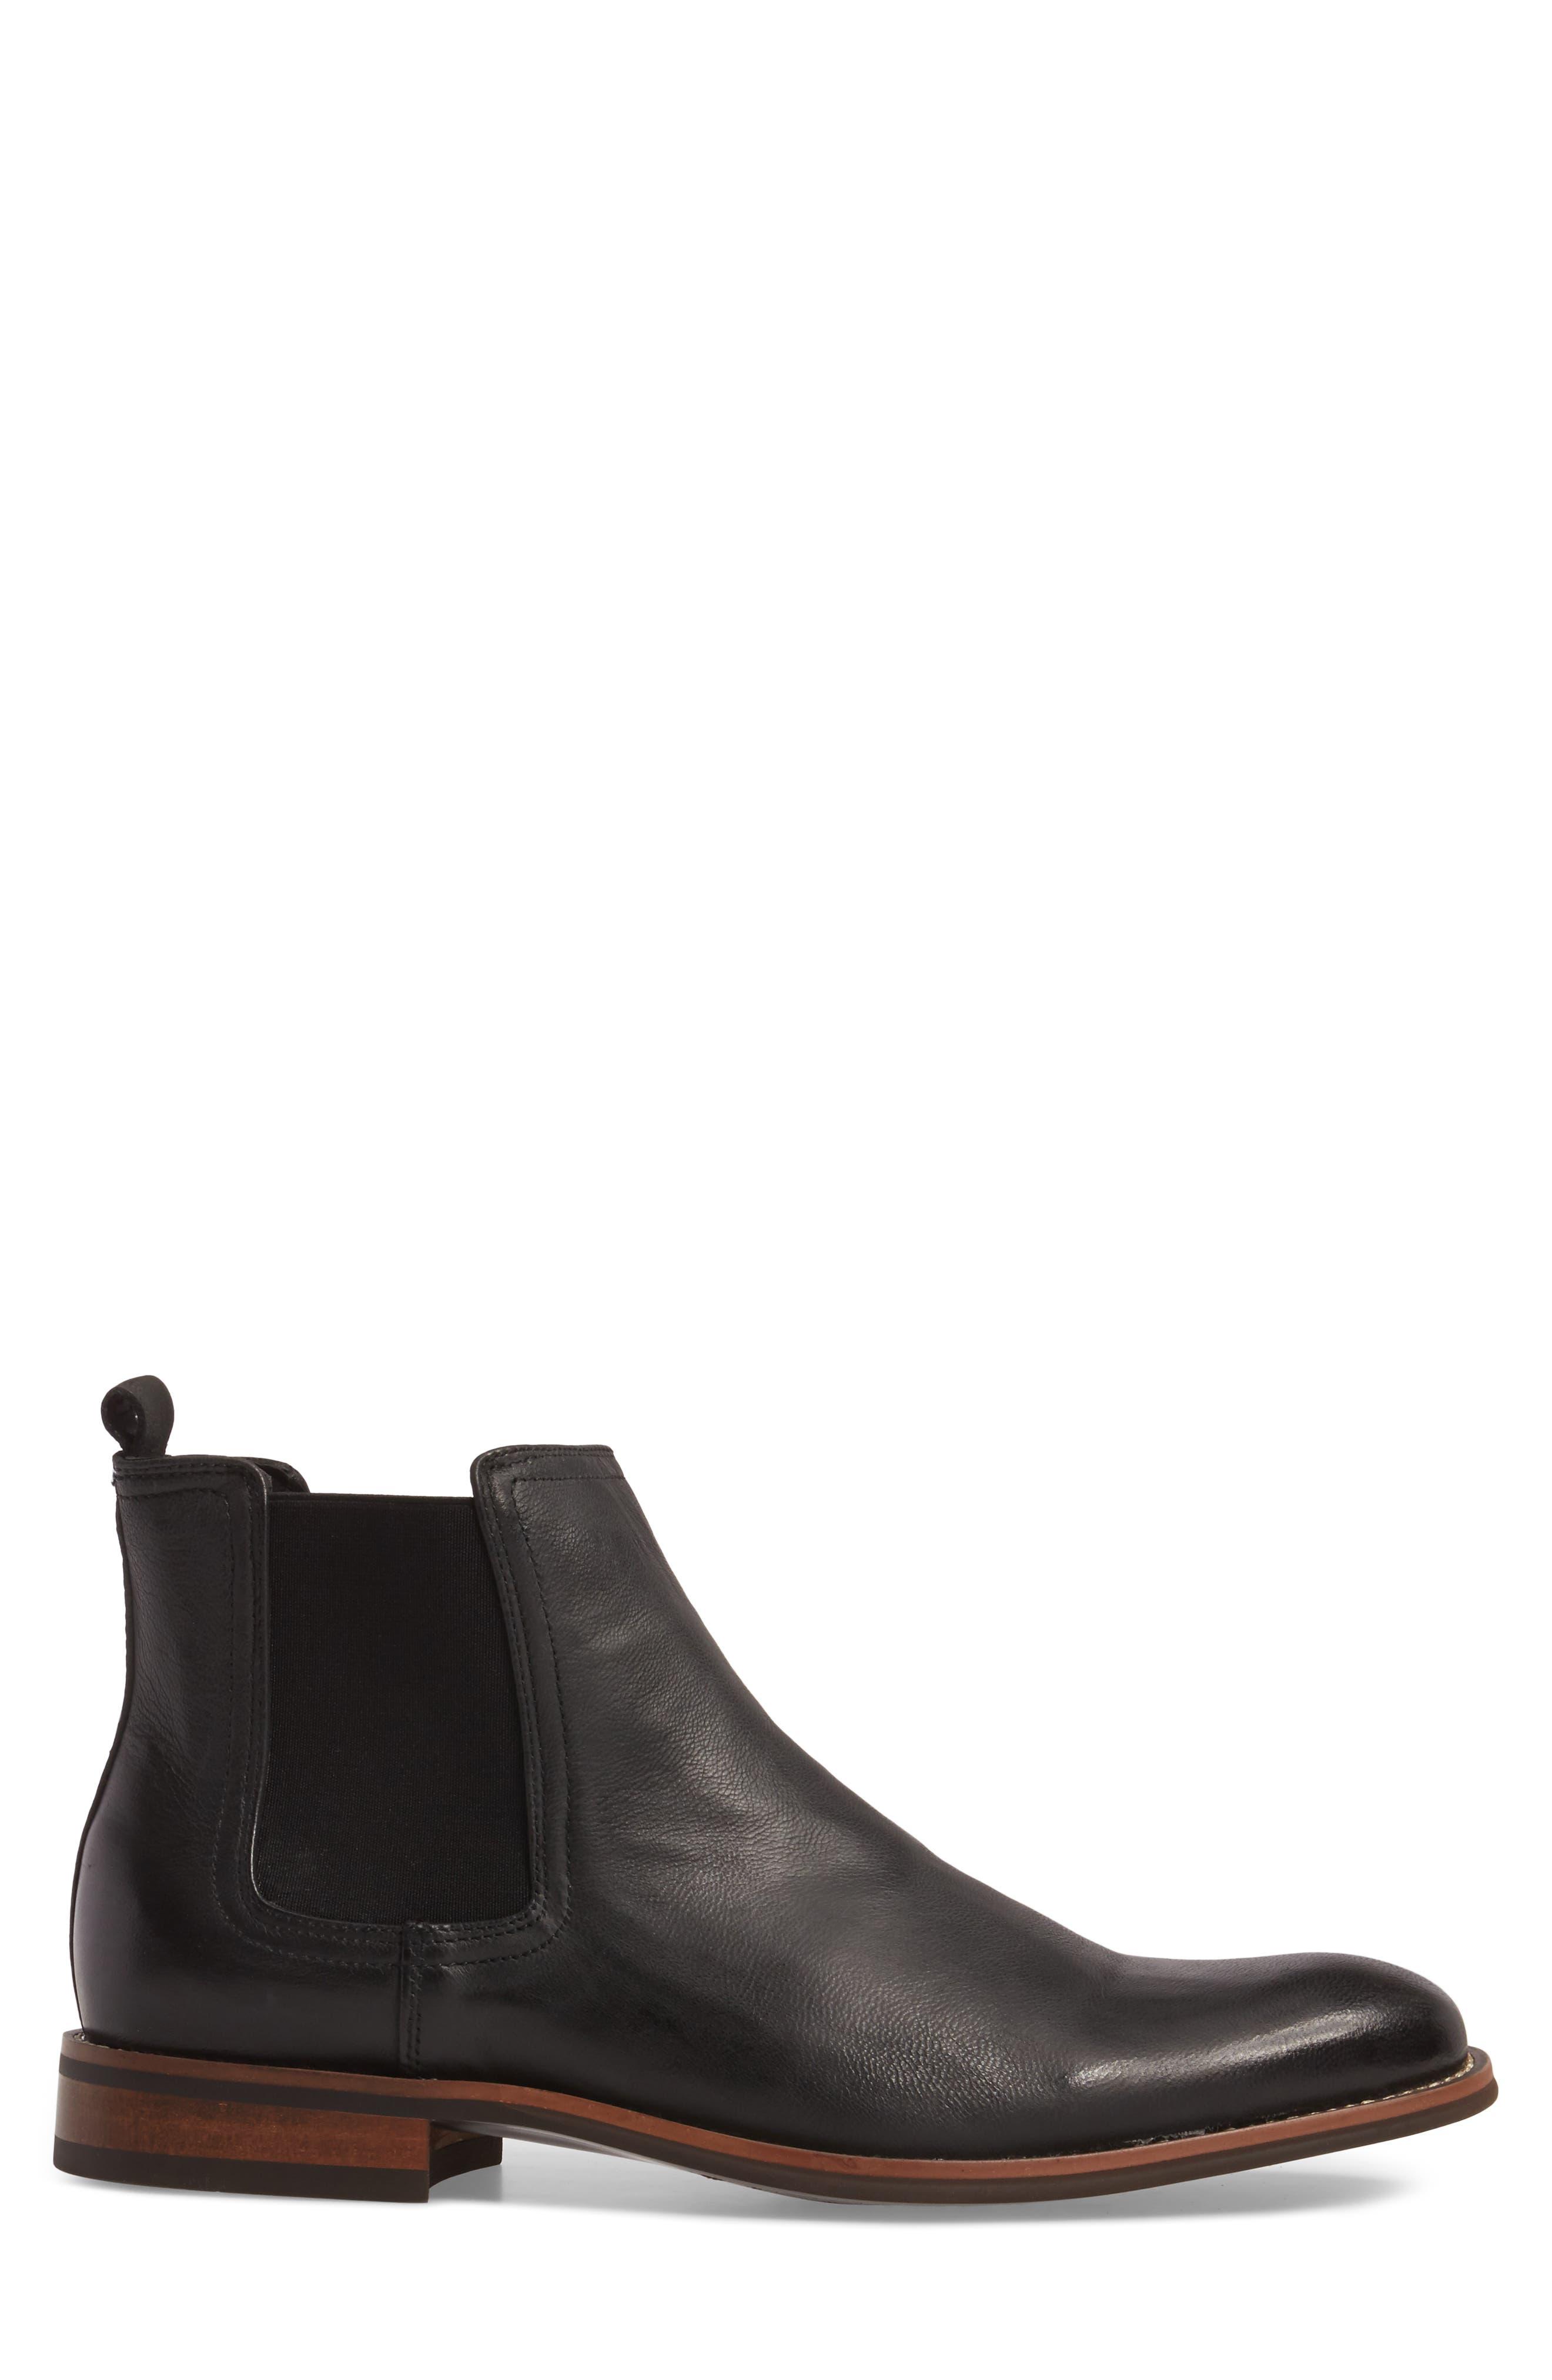 Lawson Chelsea Boot,                             Alternate thumbnail 3, color,                             BLACK